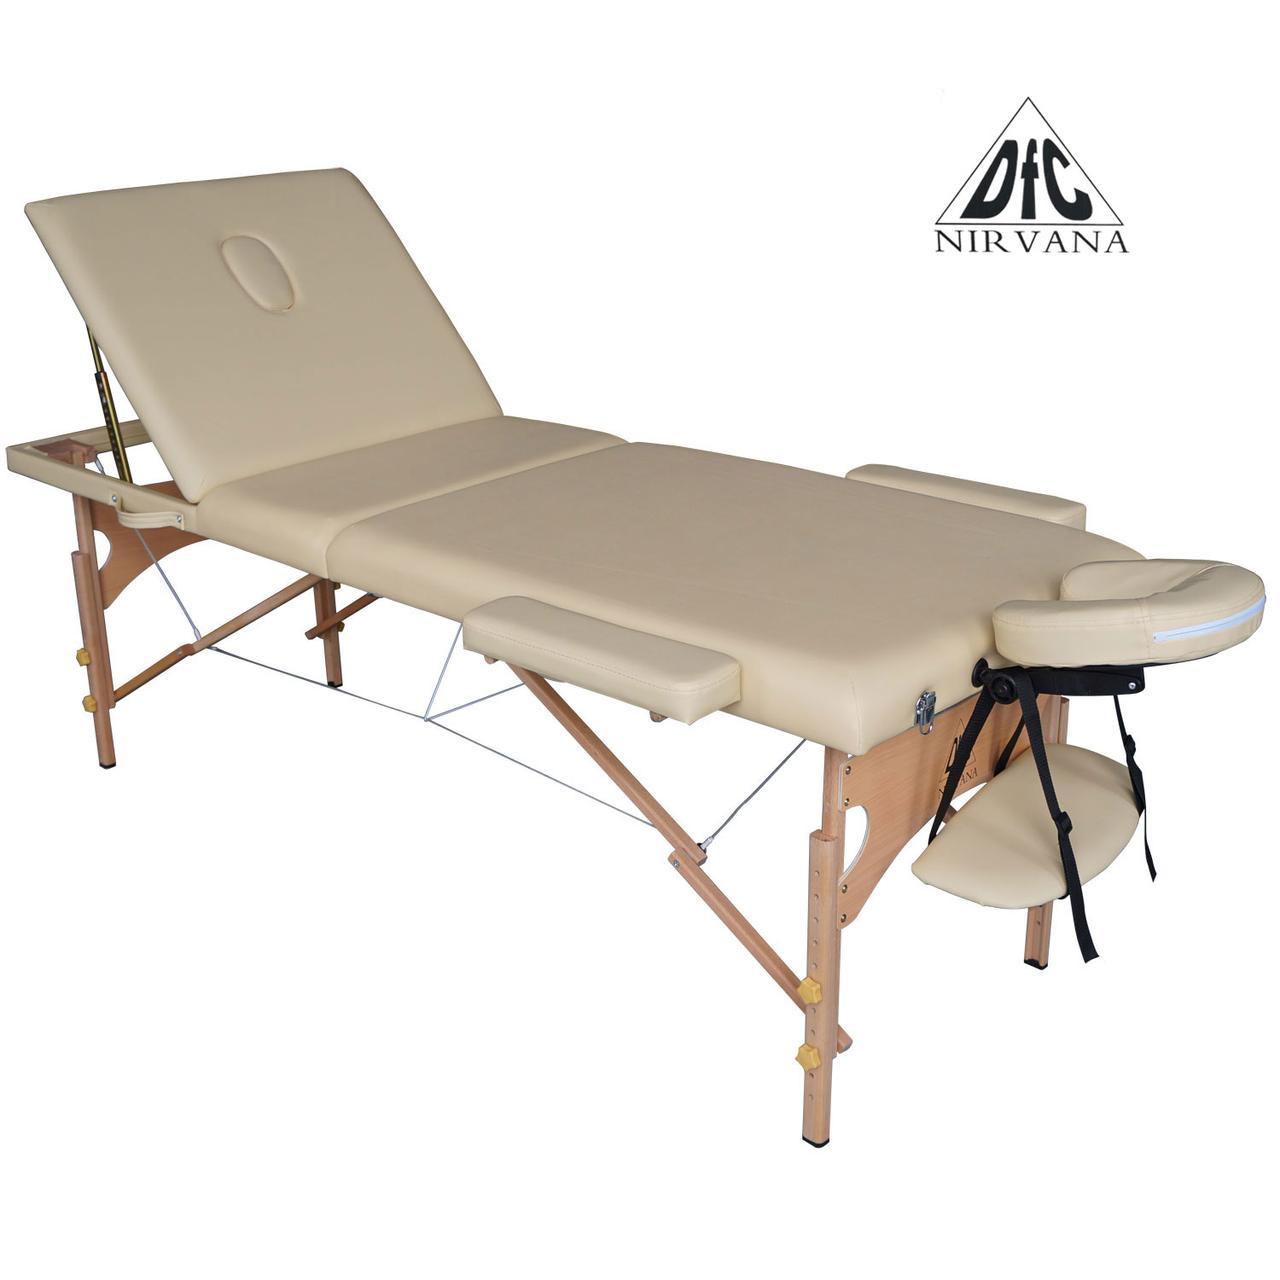 Массажный стол DFC NIRVANA Relax Pro